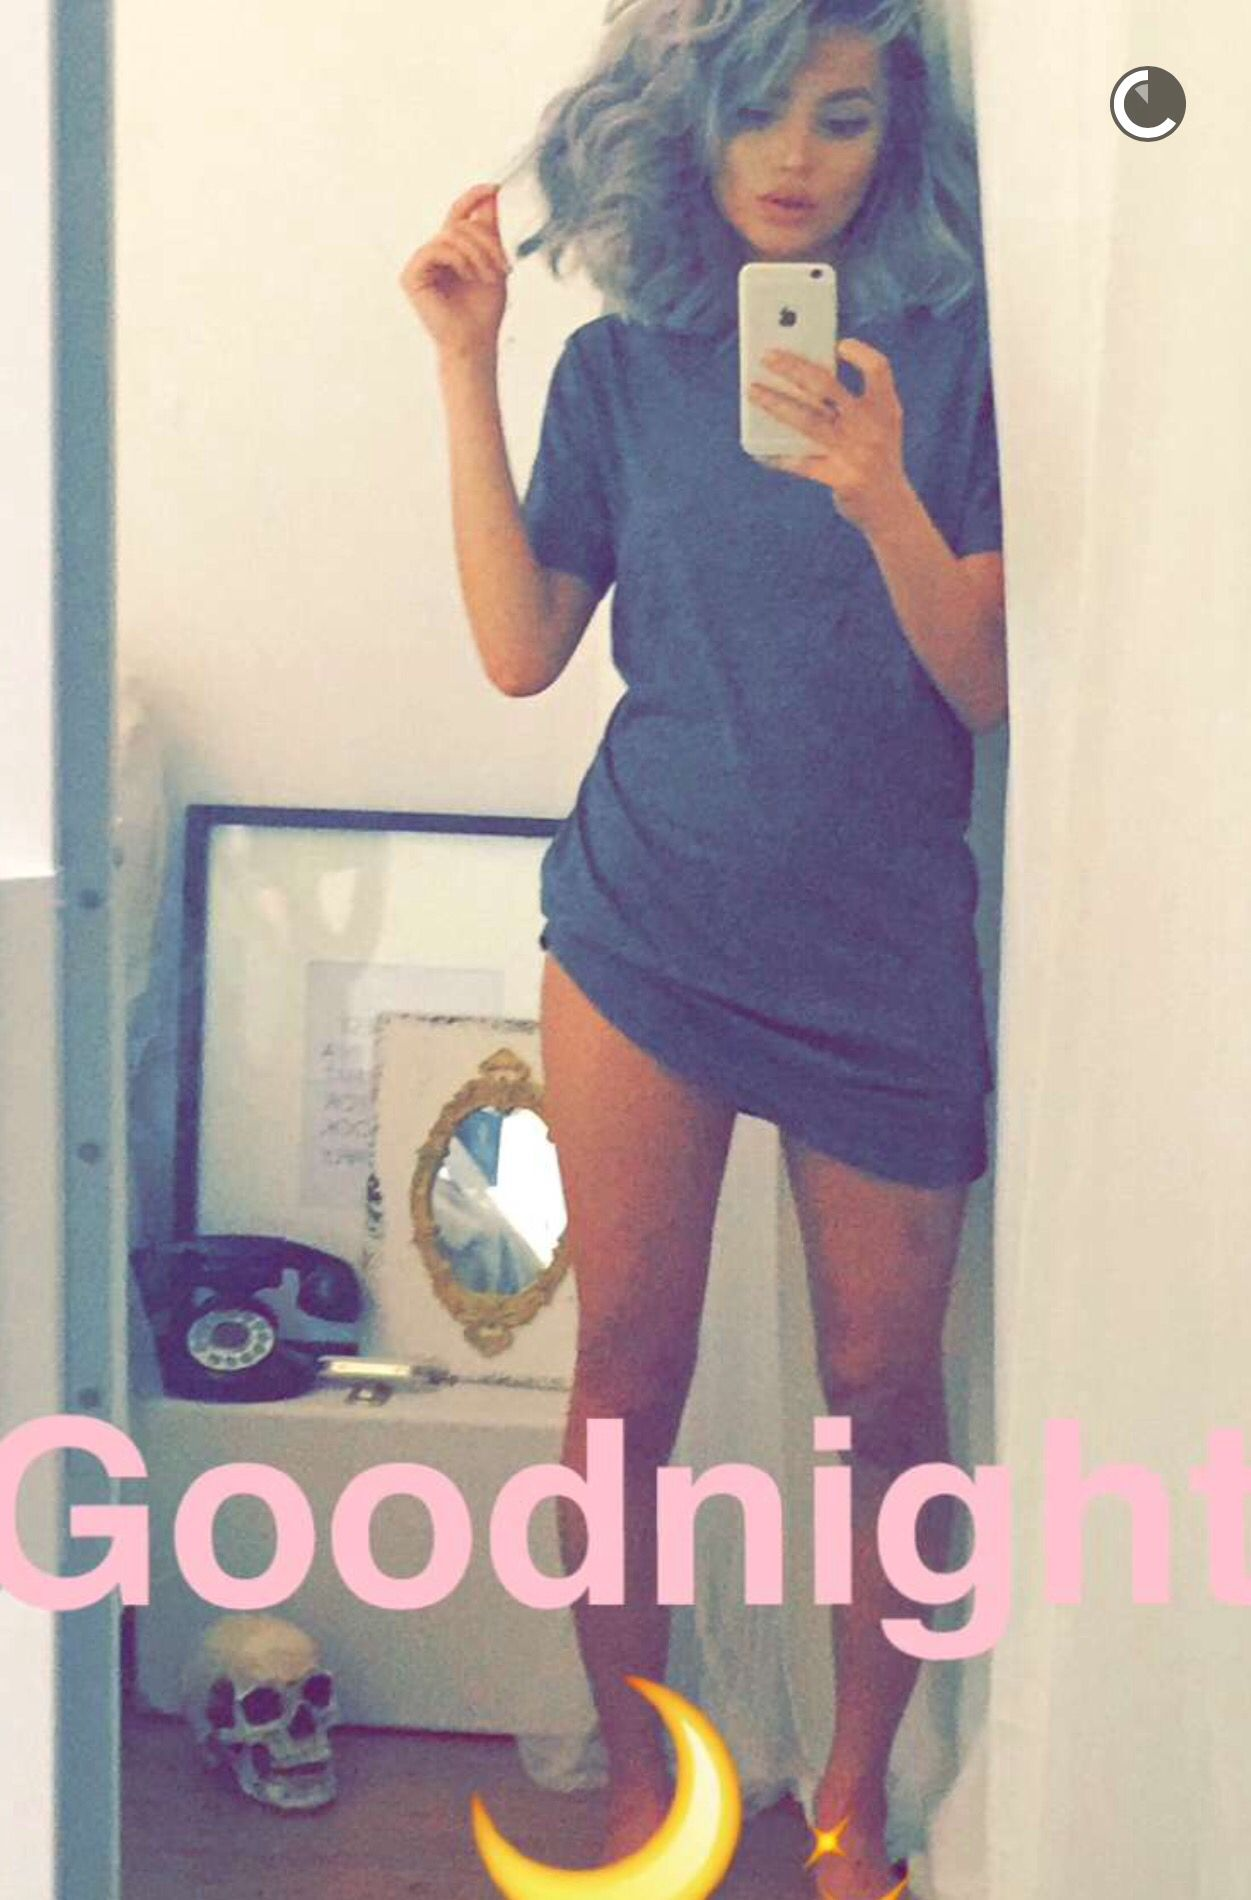 Selfie Melissa Eckman nudes (36 foto and video), Pussy, Hot, Instagram, swimsuit 2015